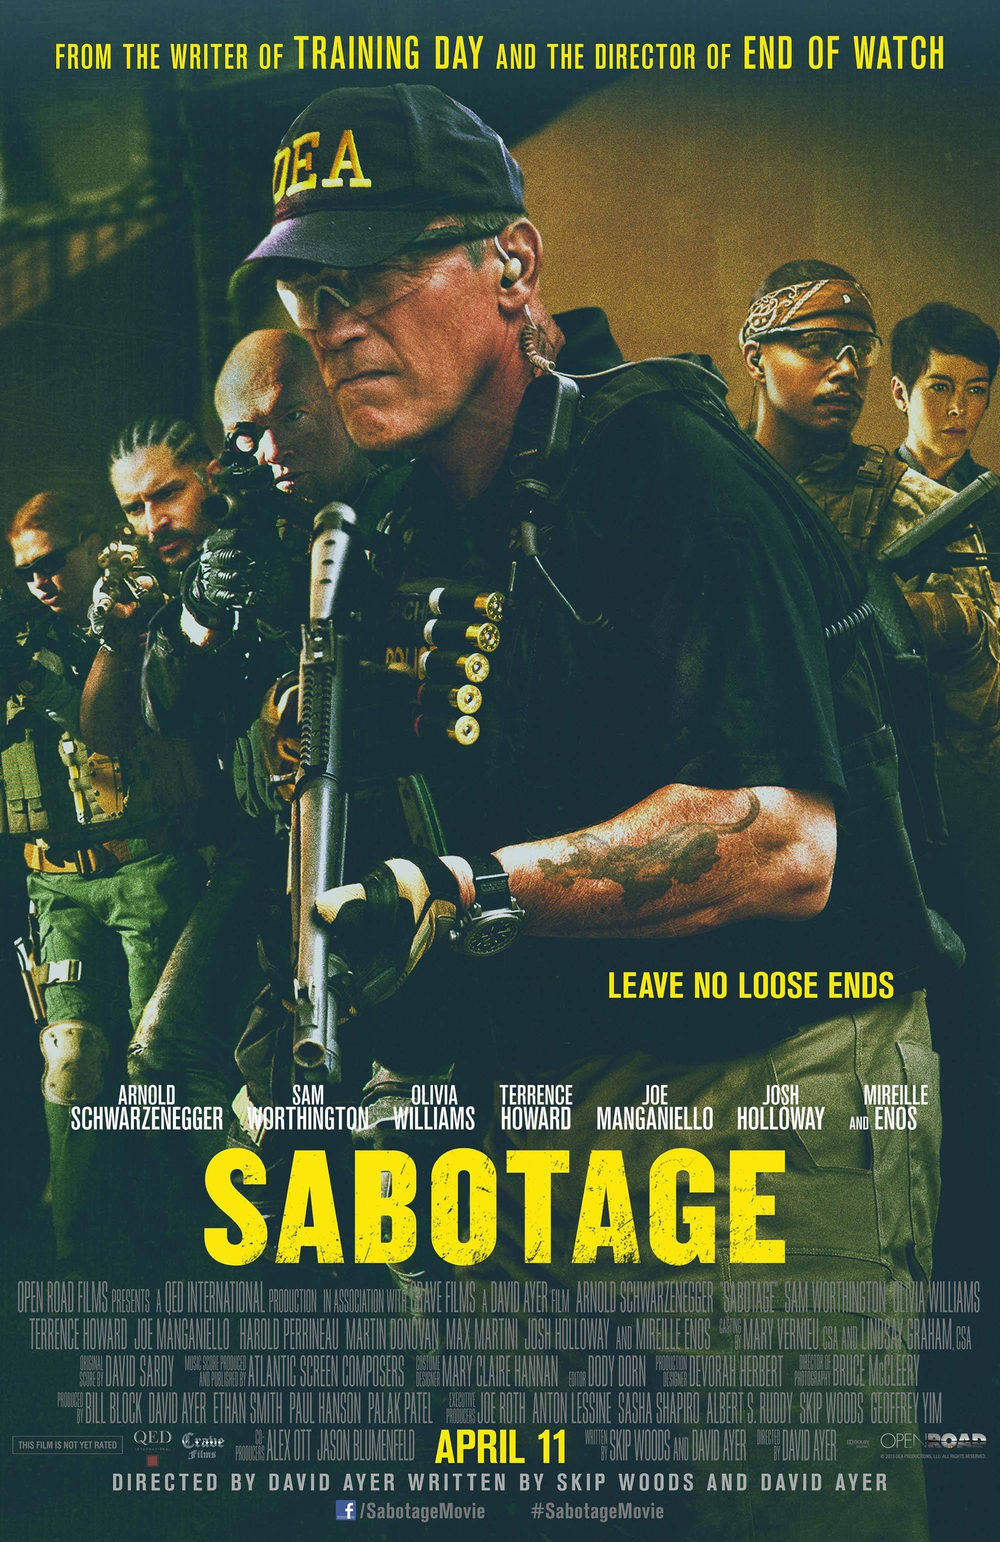 action-packed-trailer-for-schwarzeneggers-sabotage.jpg